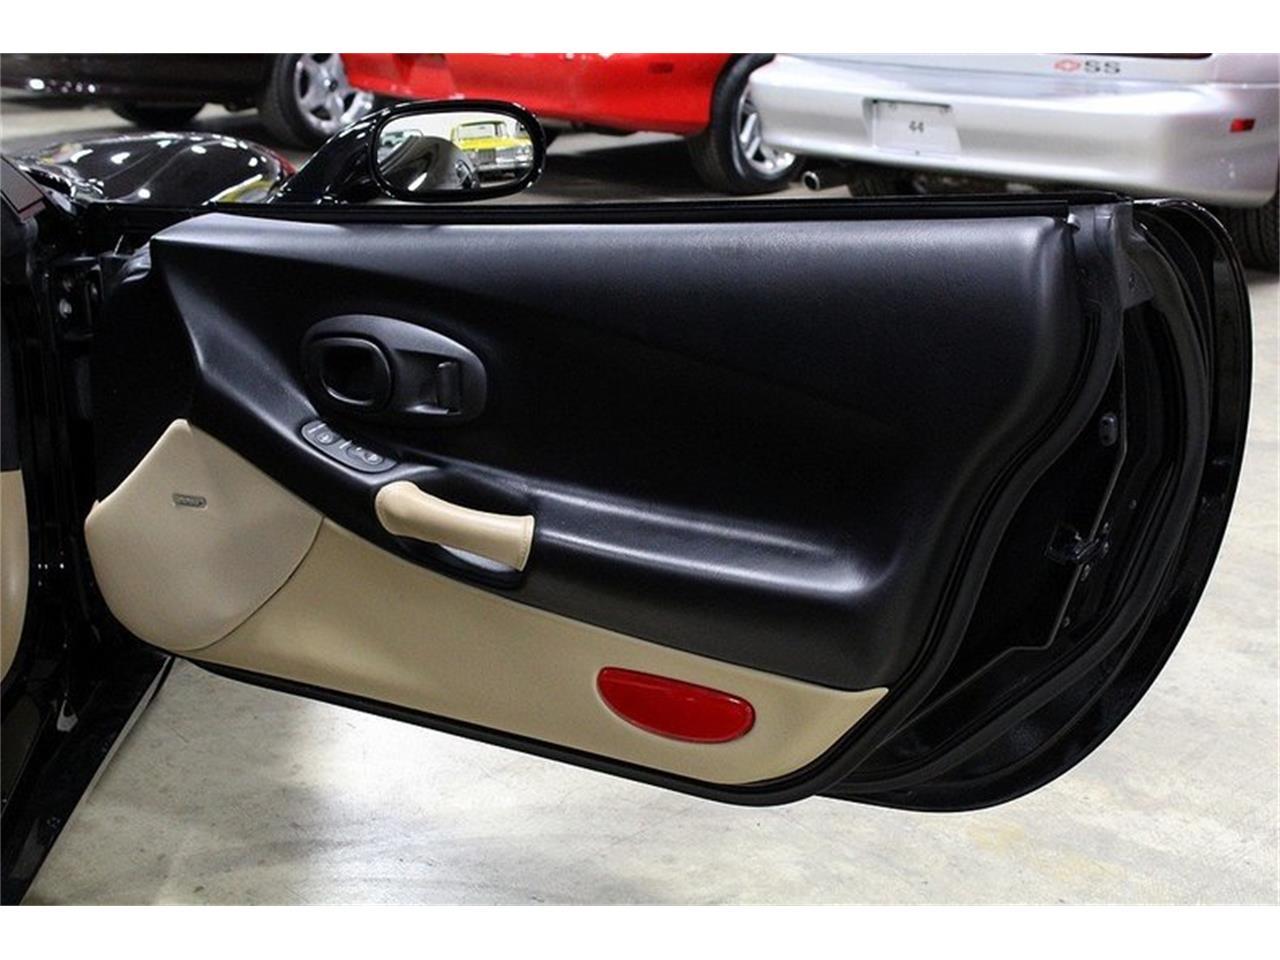 Large Picture of 1998 Chevrolet Corvette located in Michigan - $14,900.00 - L5NJ